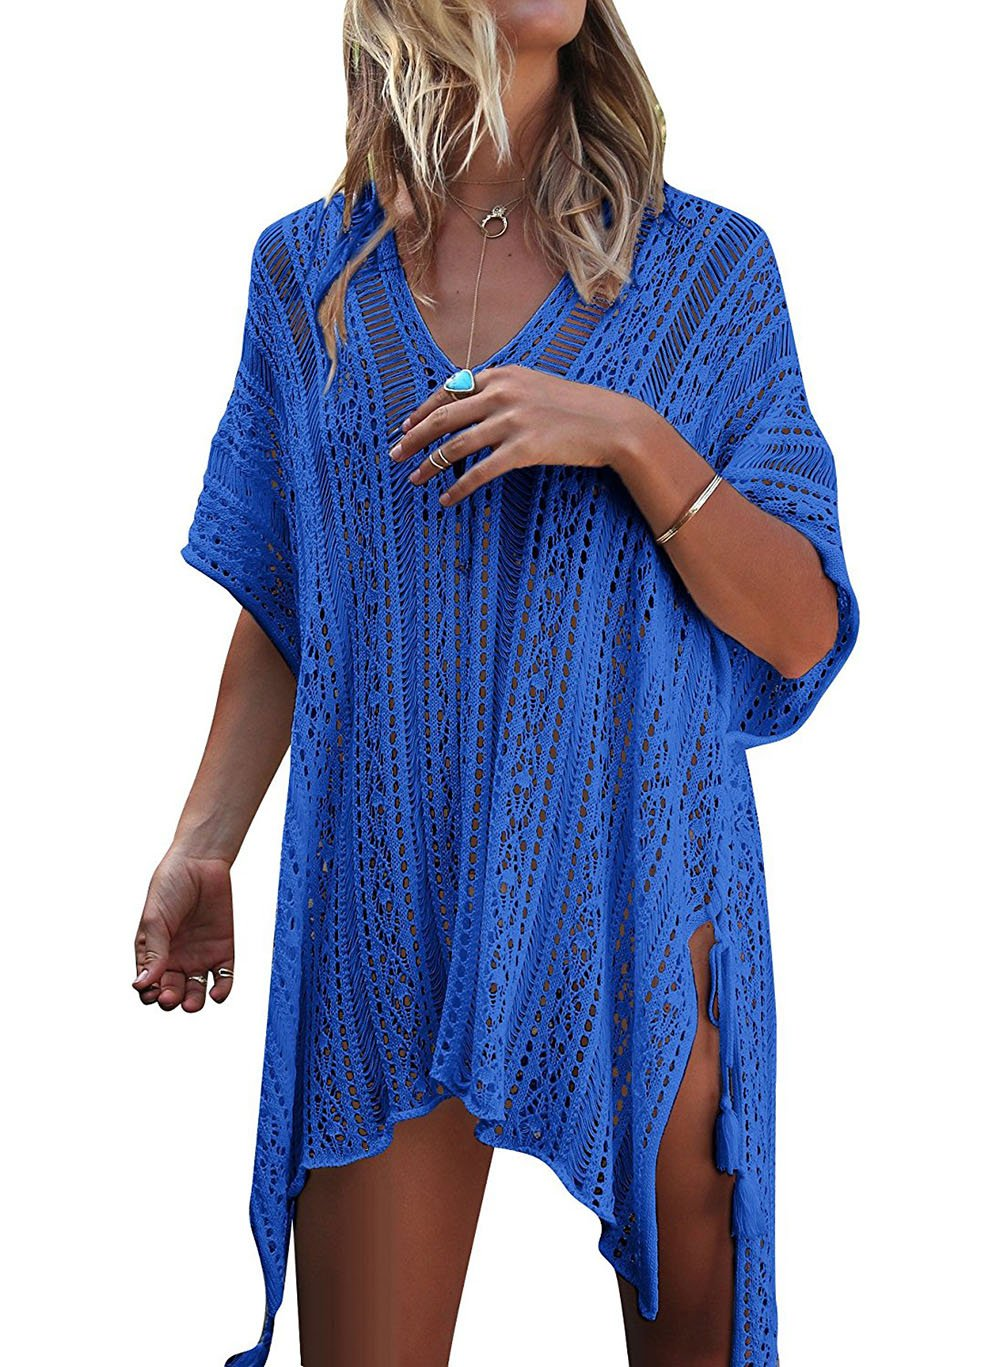 HARHAY Women's Summer Swimsuit Bikini Beach Swimwear Cover up Blue